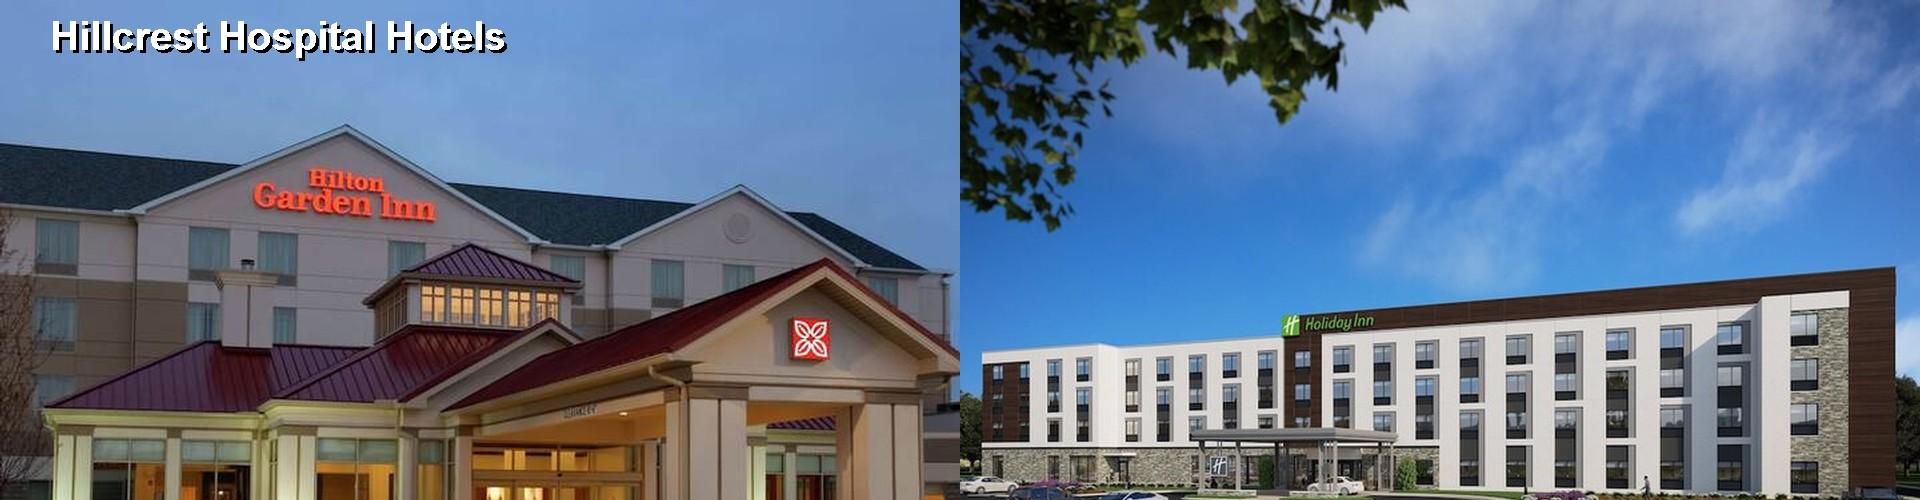 Stunning Best Hotels Near Hillcrest Hospital With Macedonia Ohio